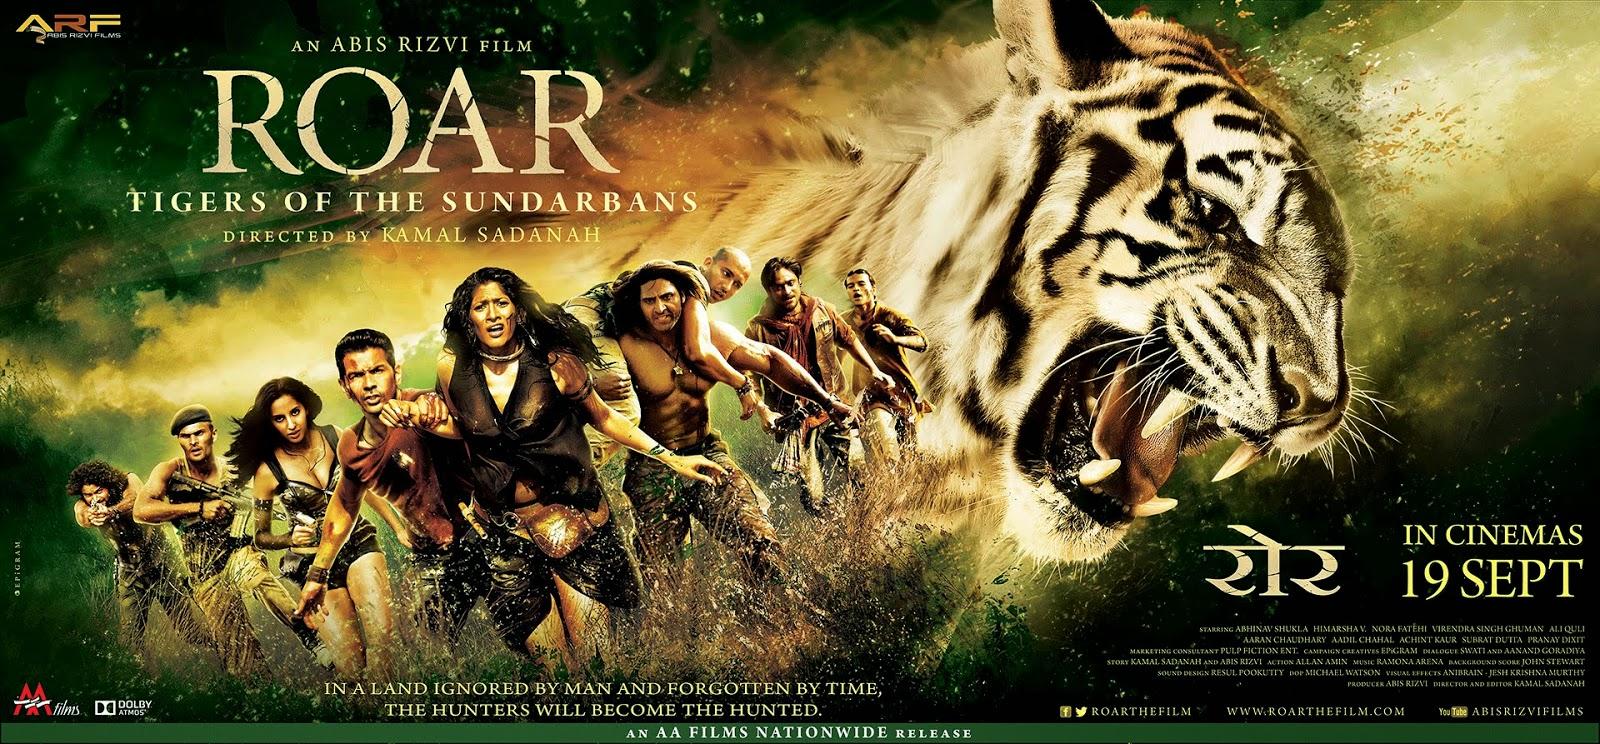 Roar : Tigers Of The Sundarbans (2014) Hindi Movie Official | LYRICS